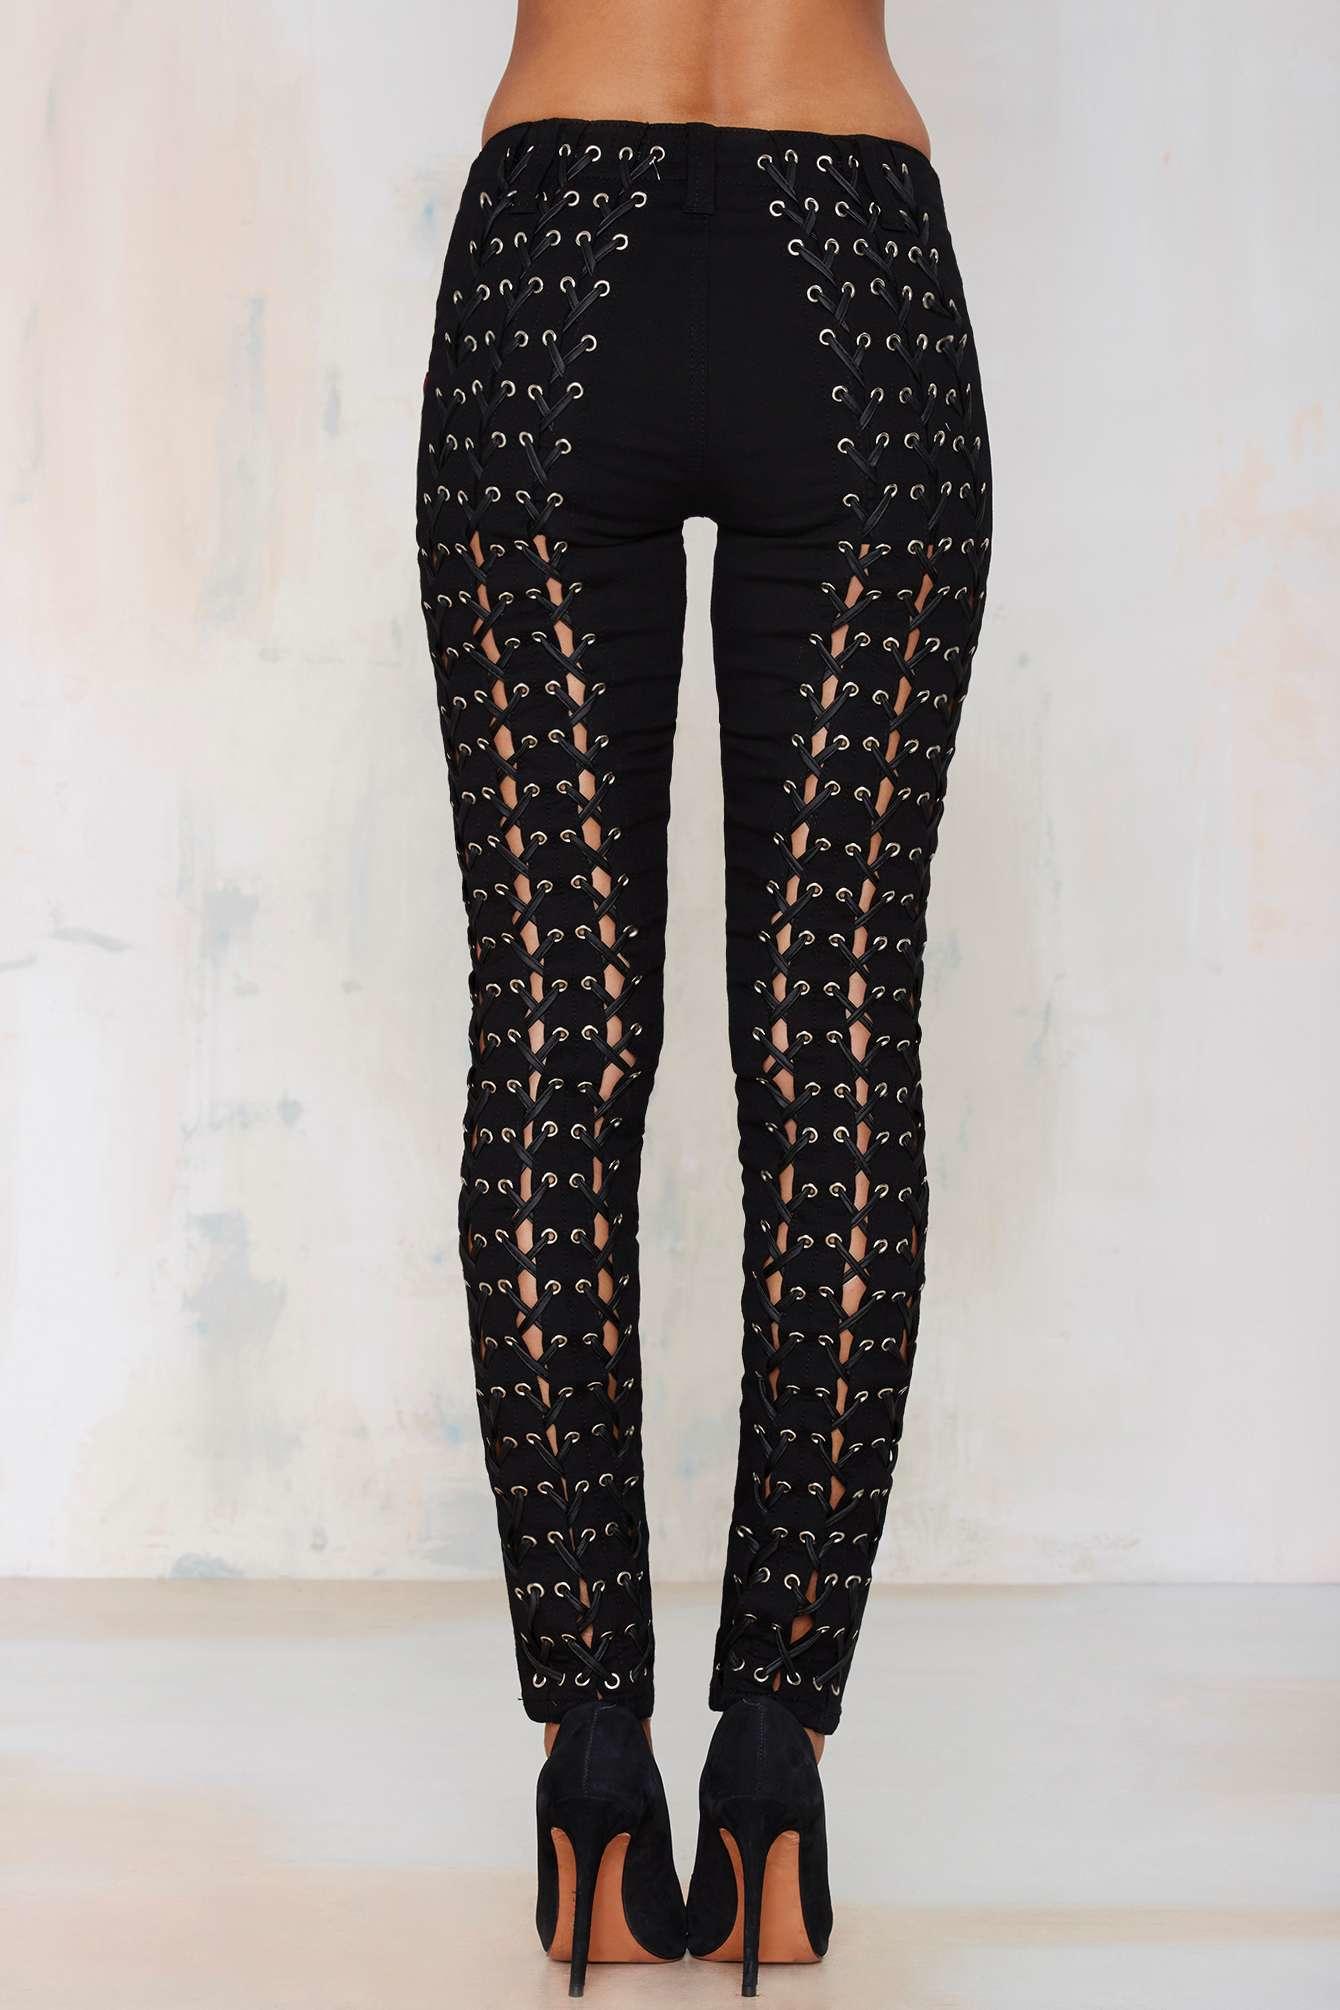 Original Tripp Jeans For Women  Women Jeans Skinny Clash Pants Previous Item